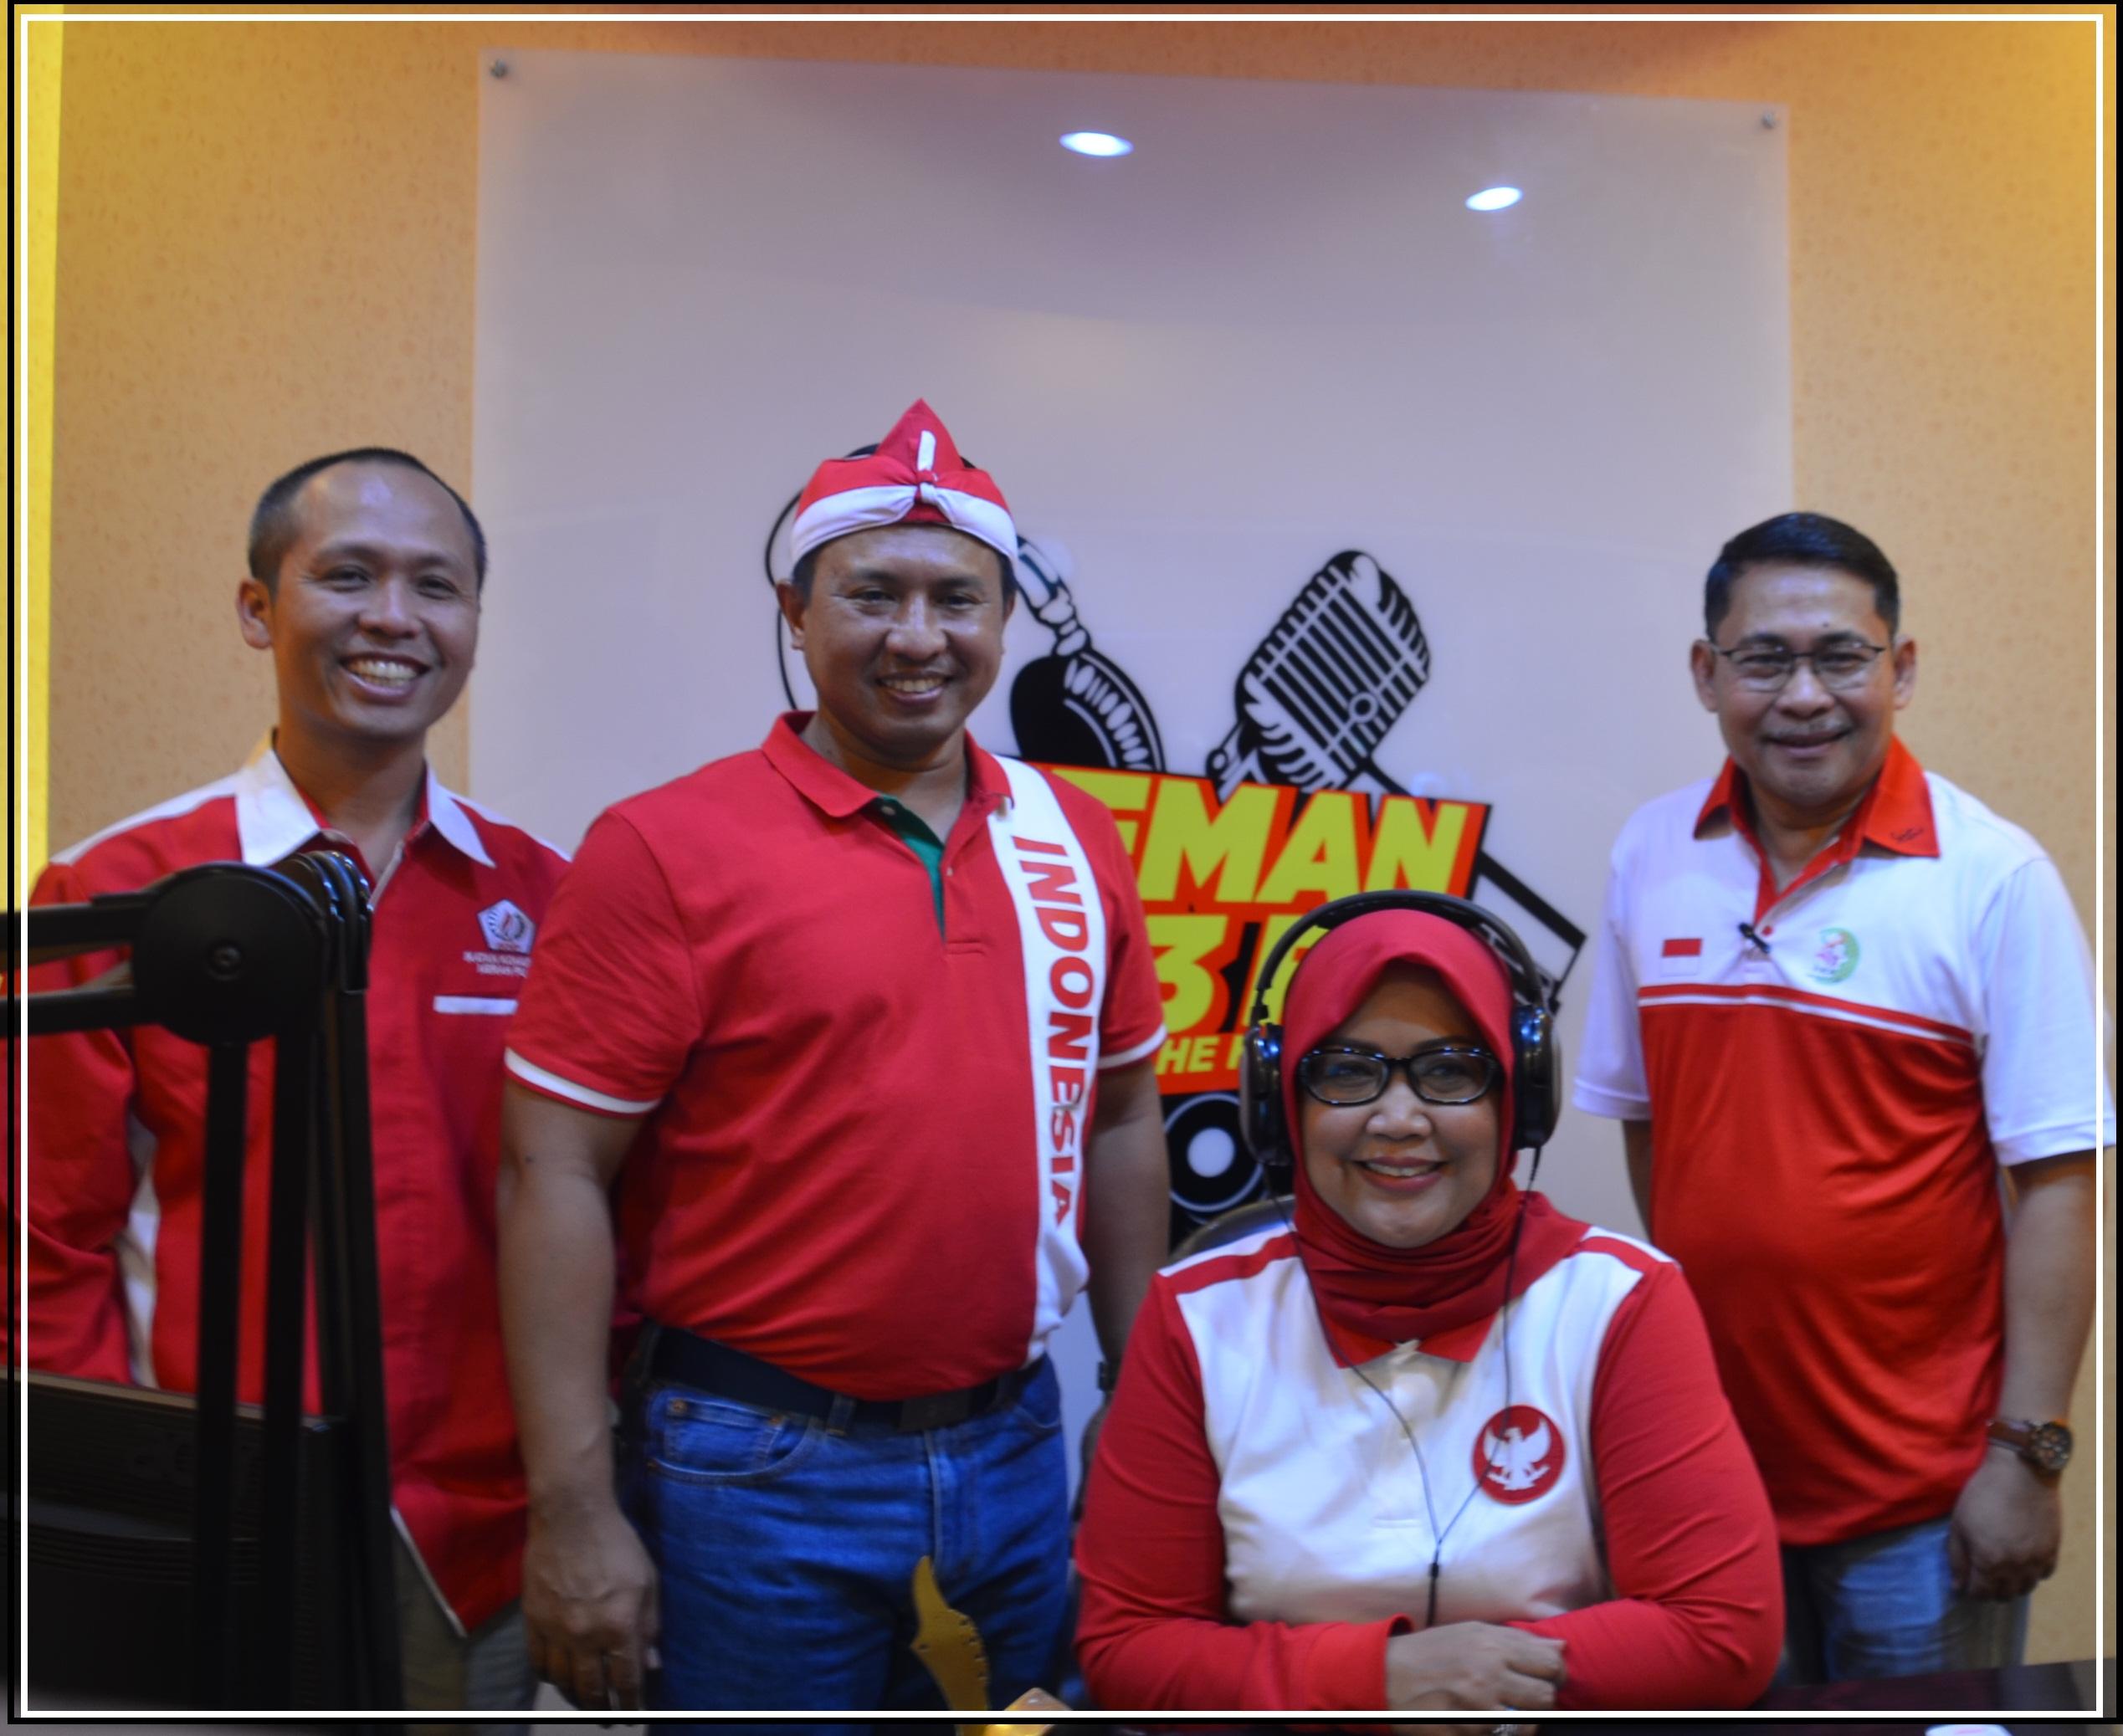 Bupati Bogor Ade Yasin Sapa Warga Lewat Radio Teman 95,3 FM